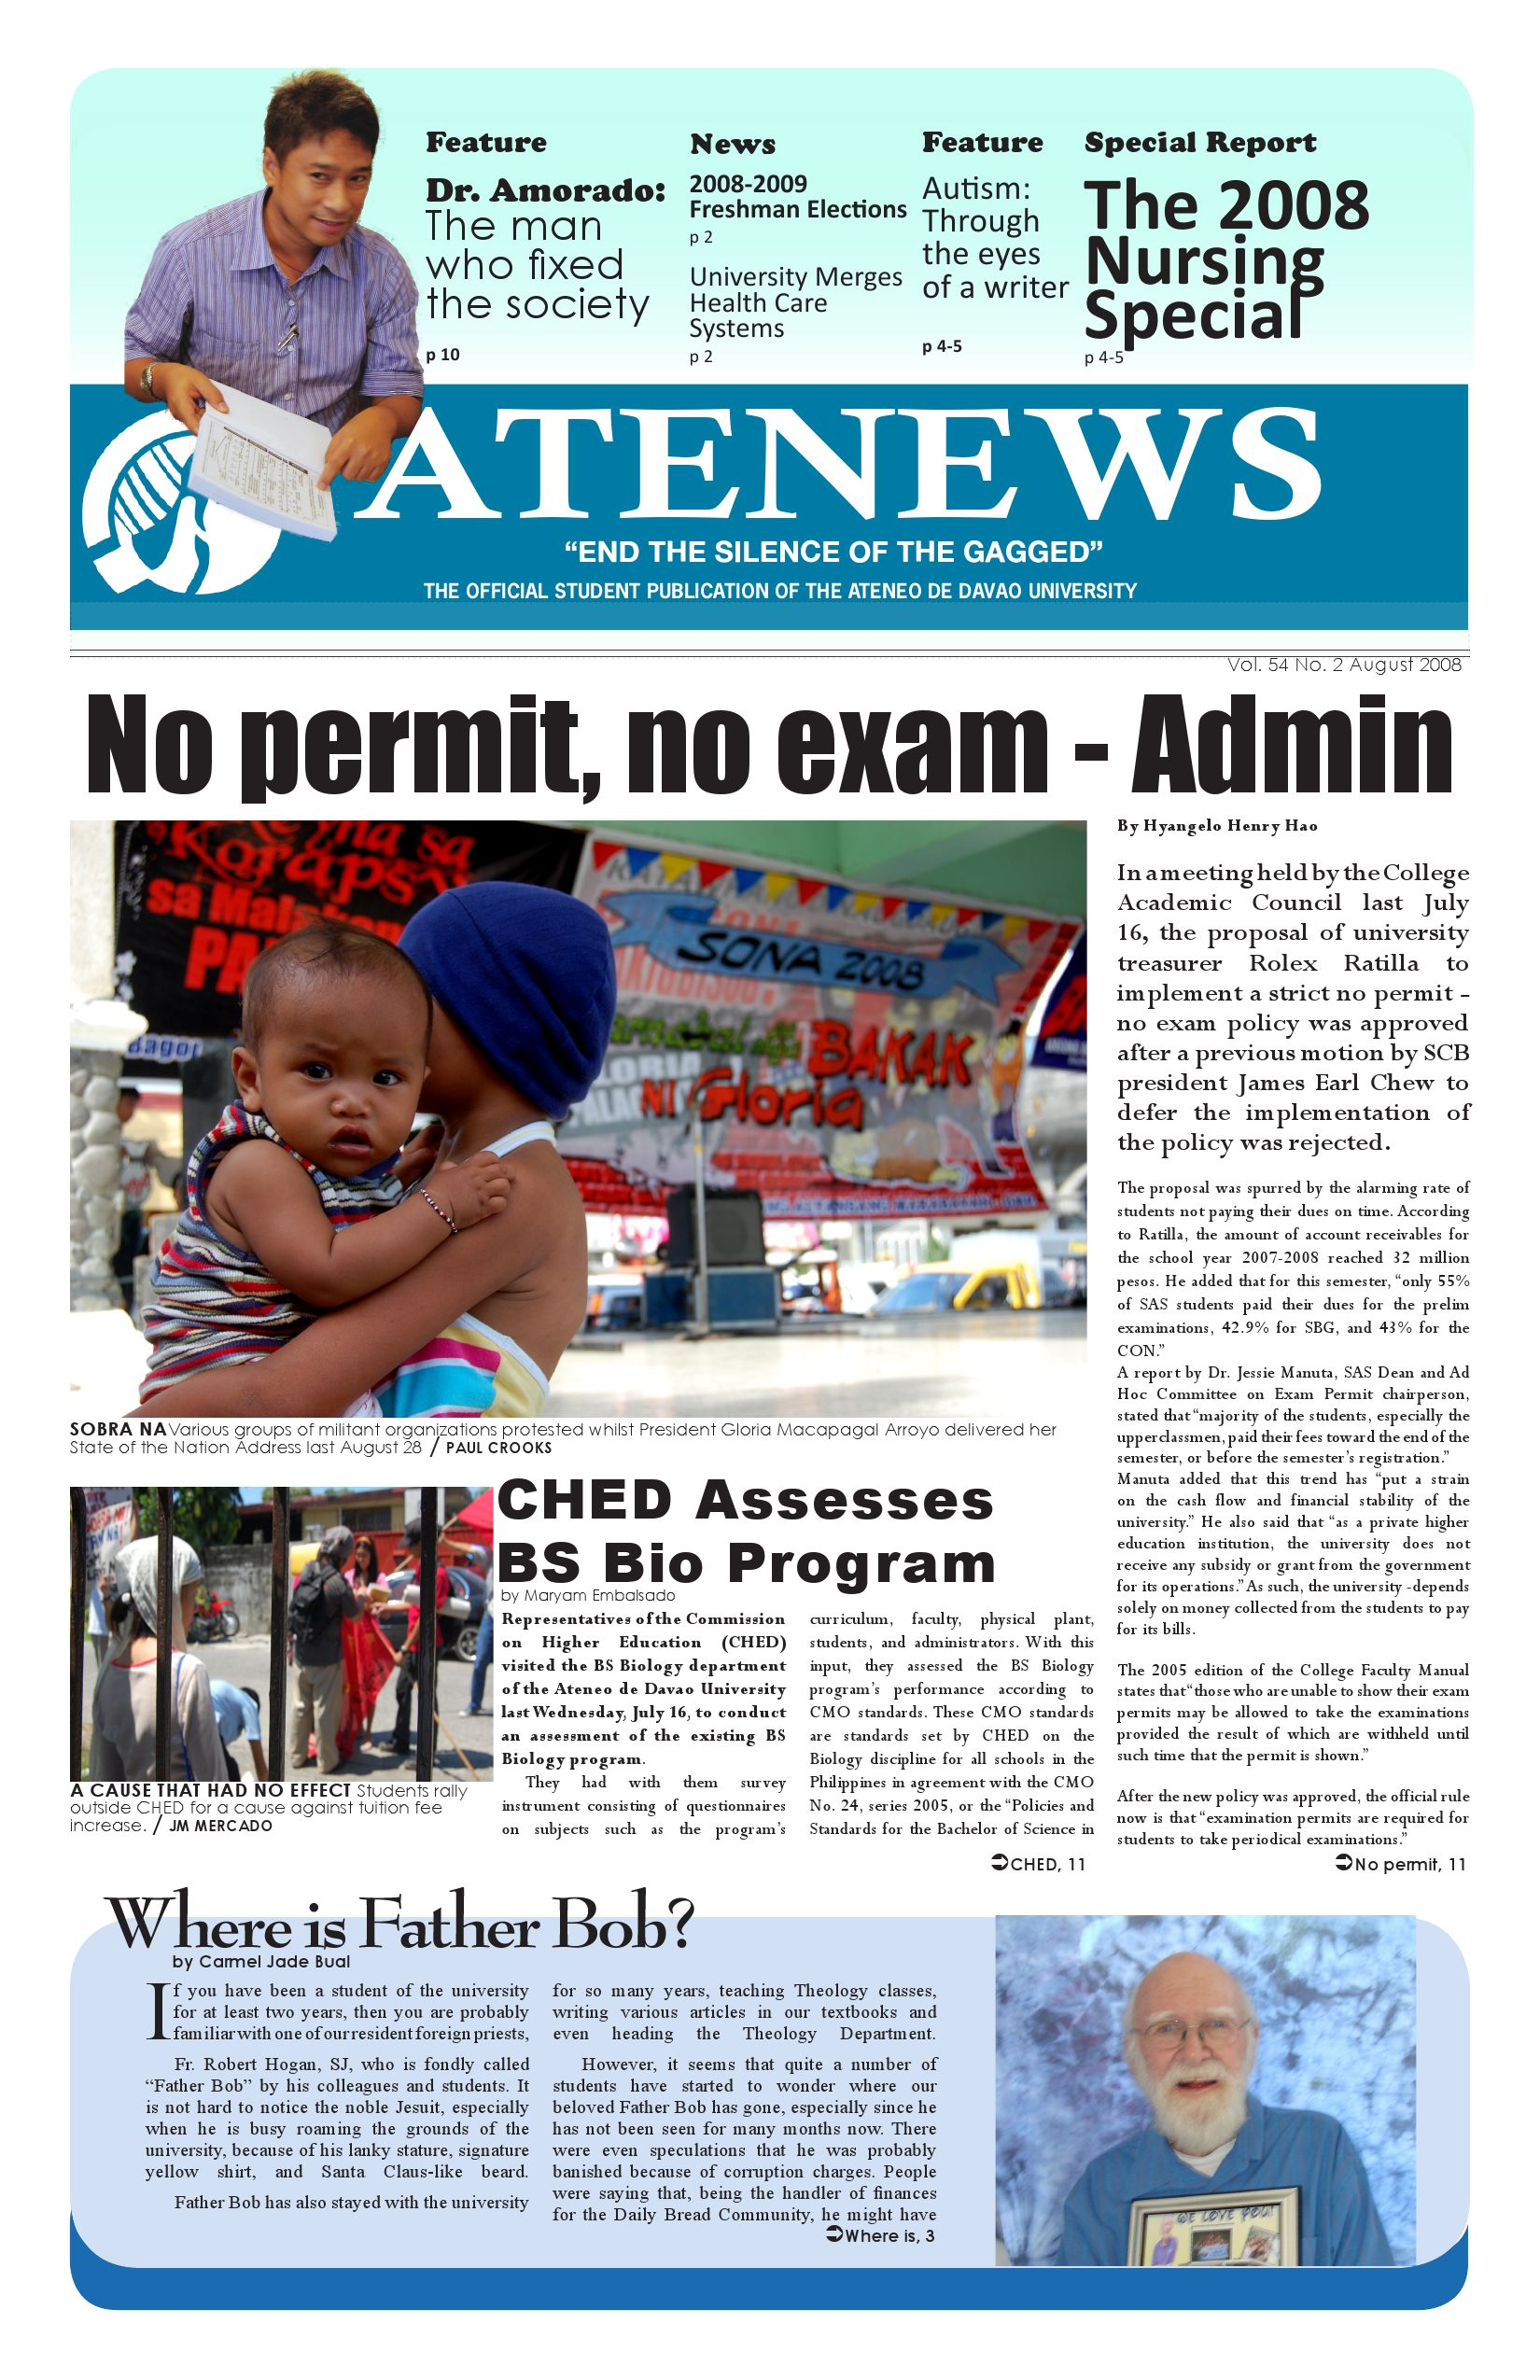 ATENEWS August 2008 Special Release by Atenews AdDU - issuu